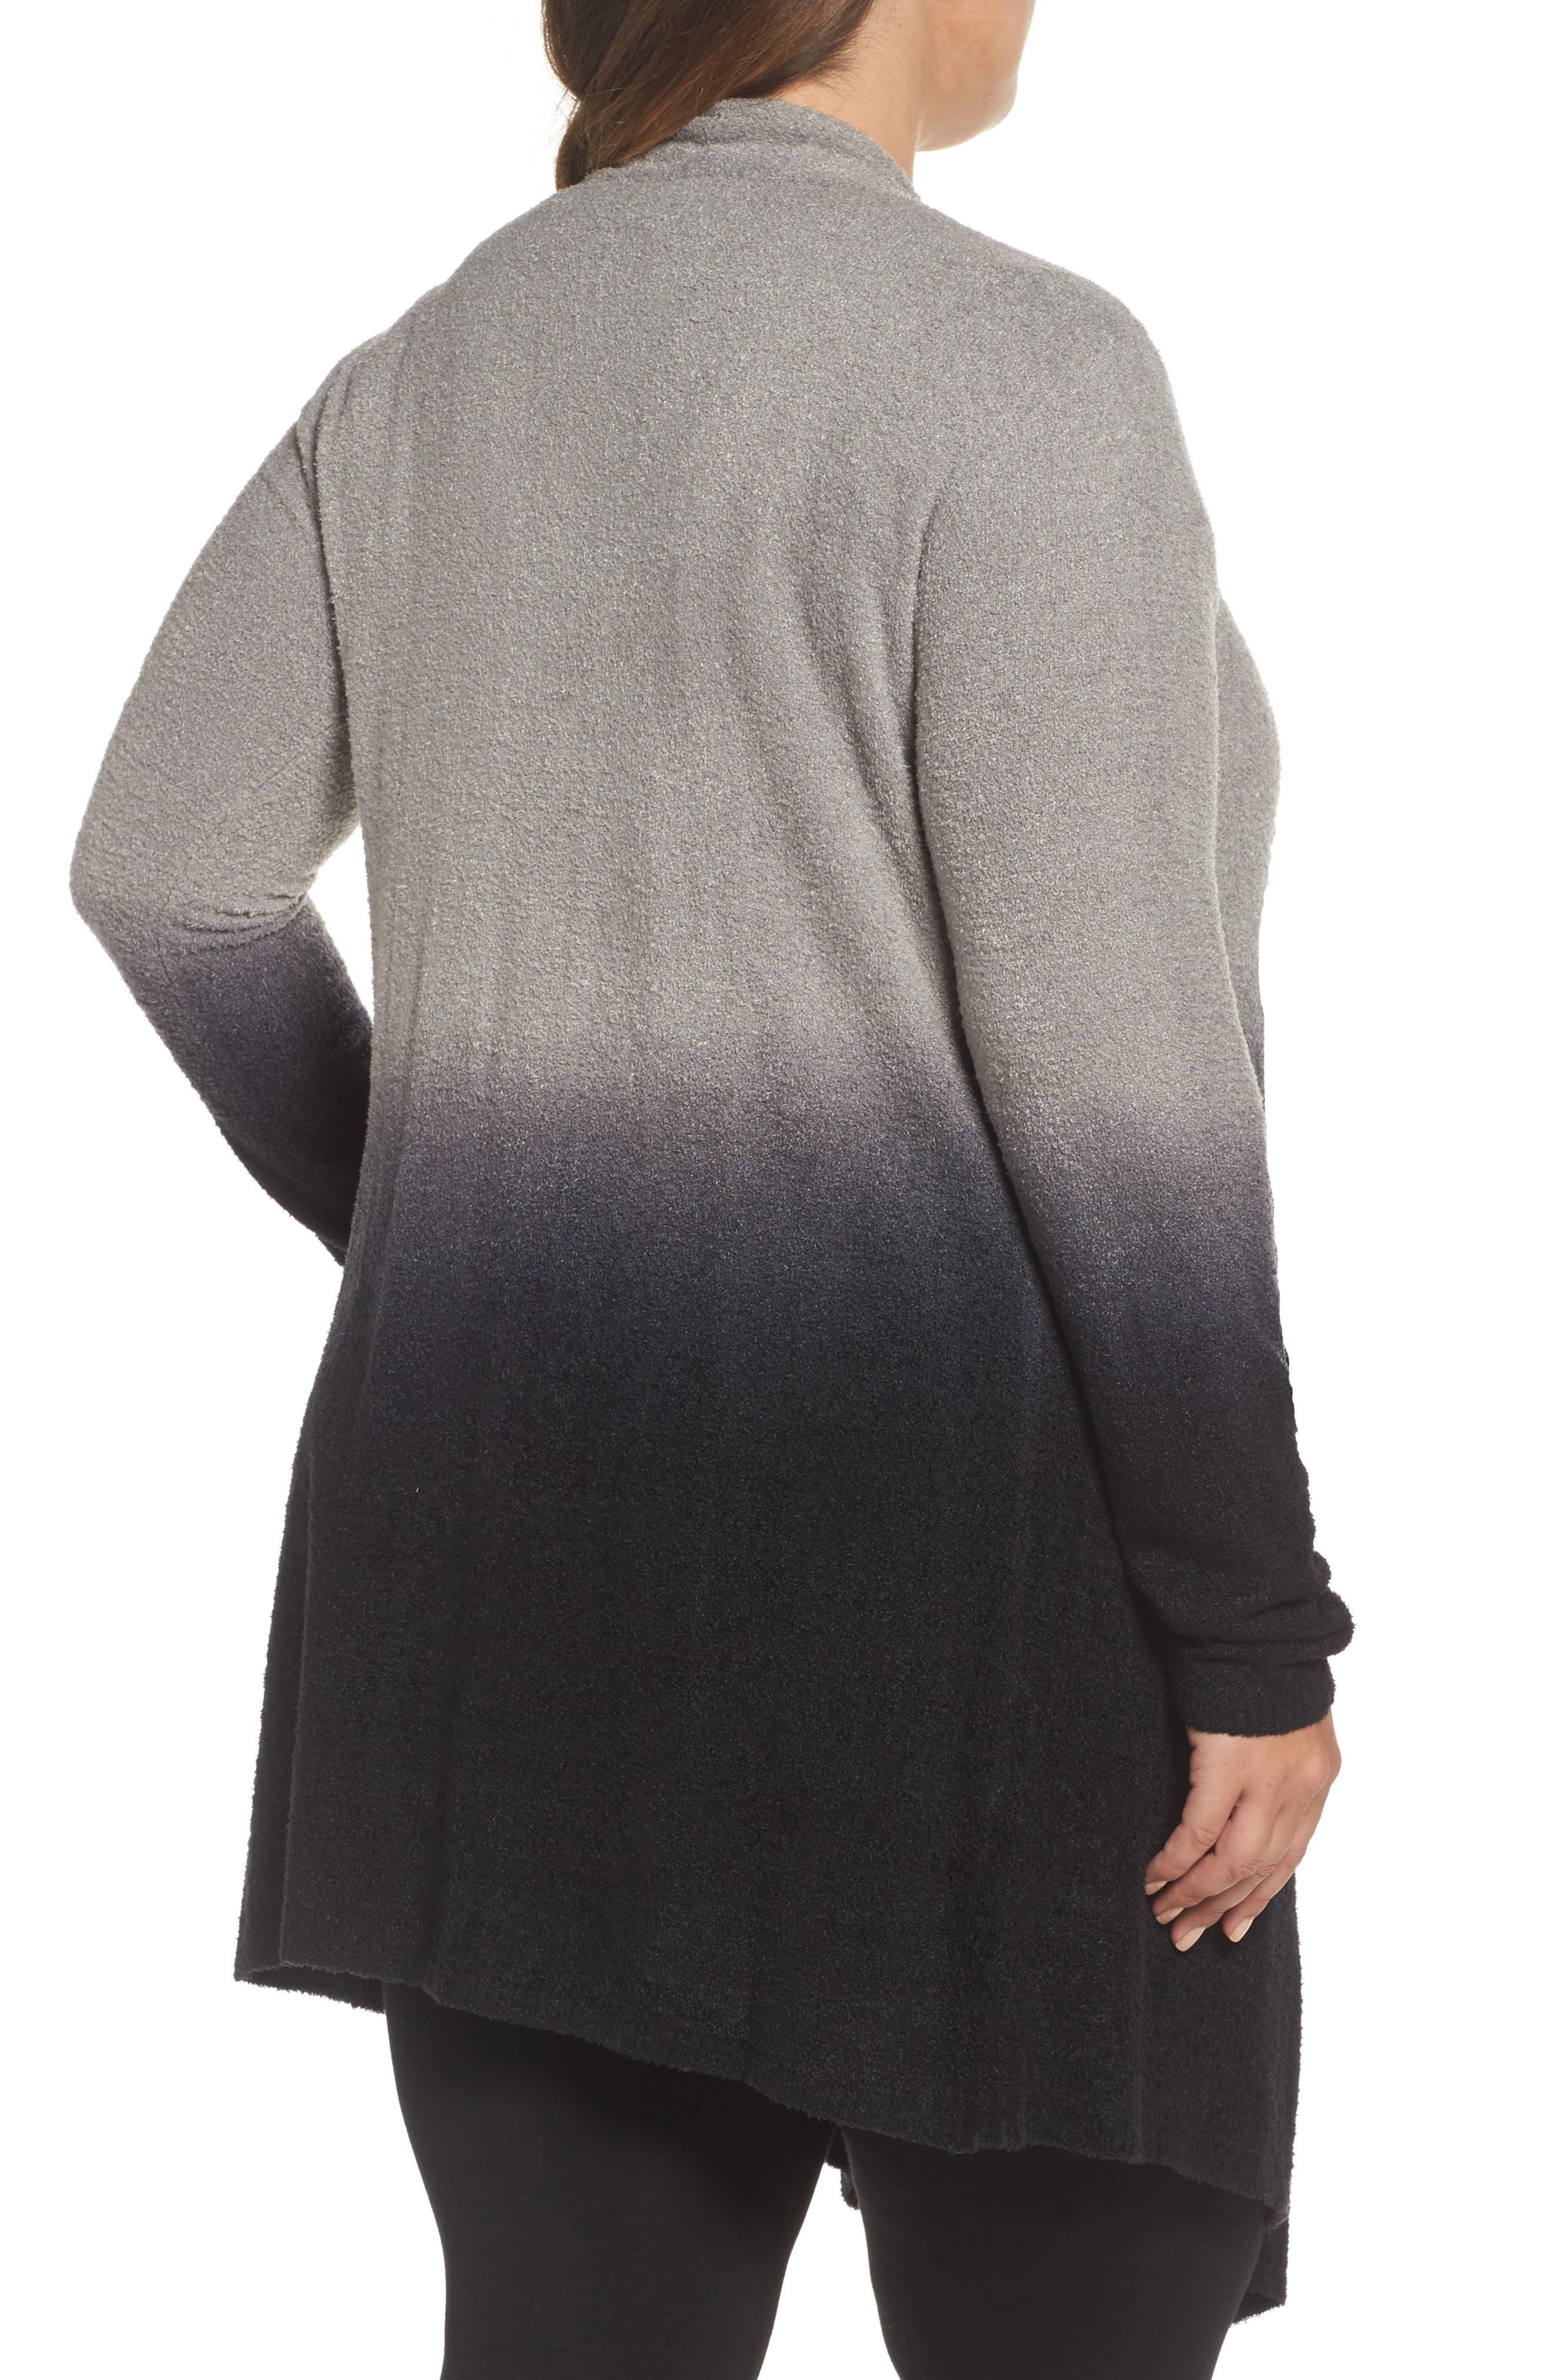 Alternate Image 2  - Barefoot Dreams® CozyChic Lite® Calypso Wrap Cardigan (Plus Size) (Nordstrom Exclusive)